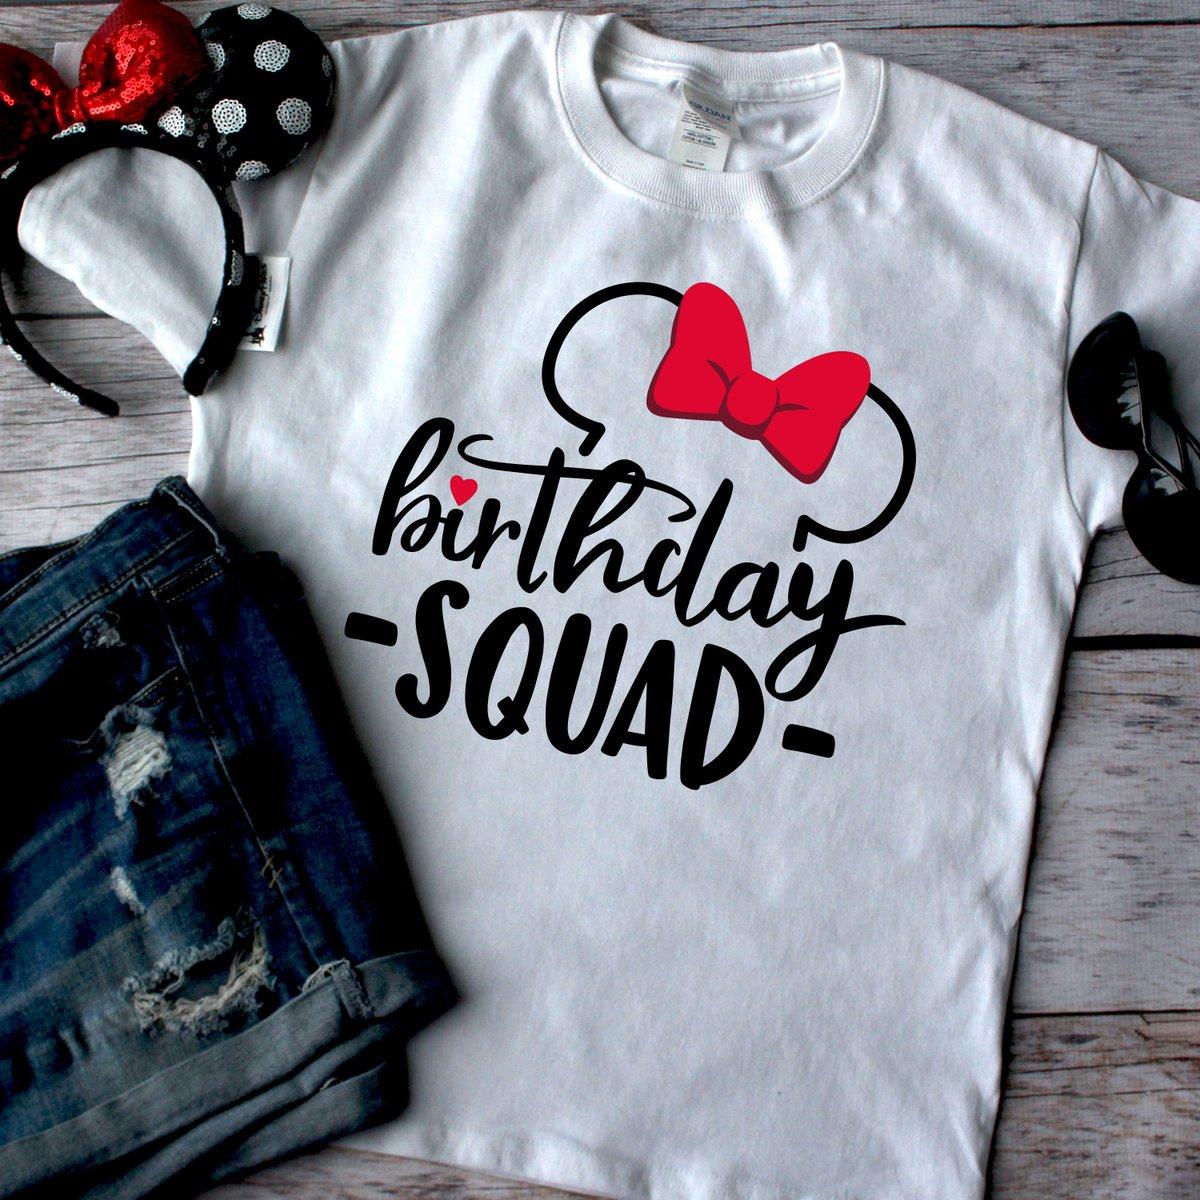 Family vacation shirt,Disney shirt,Disney Vacation Shirt,Minnie Mouse Vacation shirt,Matching shirts,Matching vacation shirt,Birthday Squad  #disneyears #toystoryforkyears